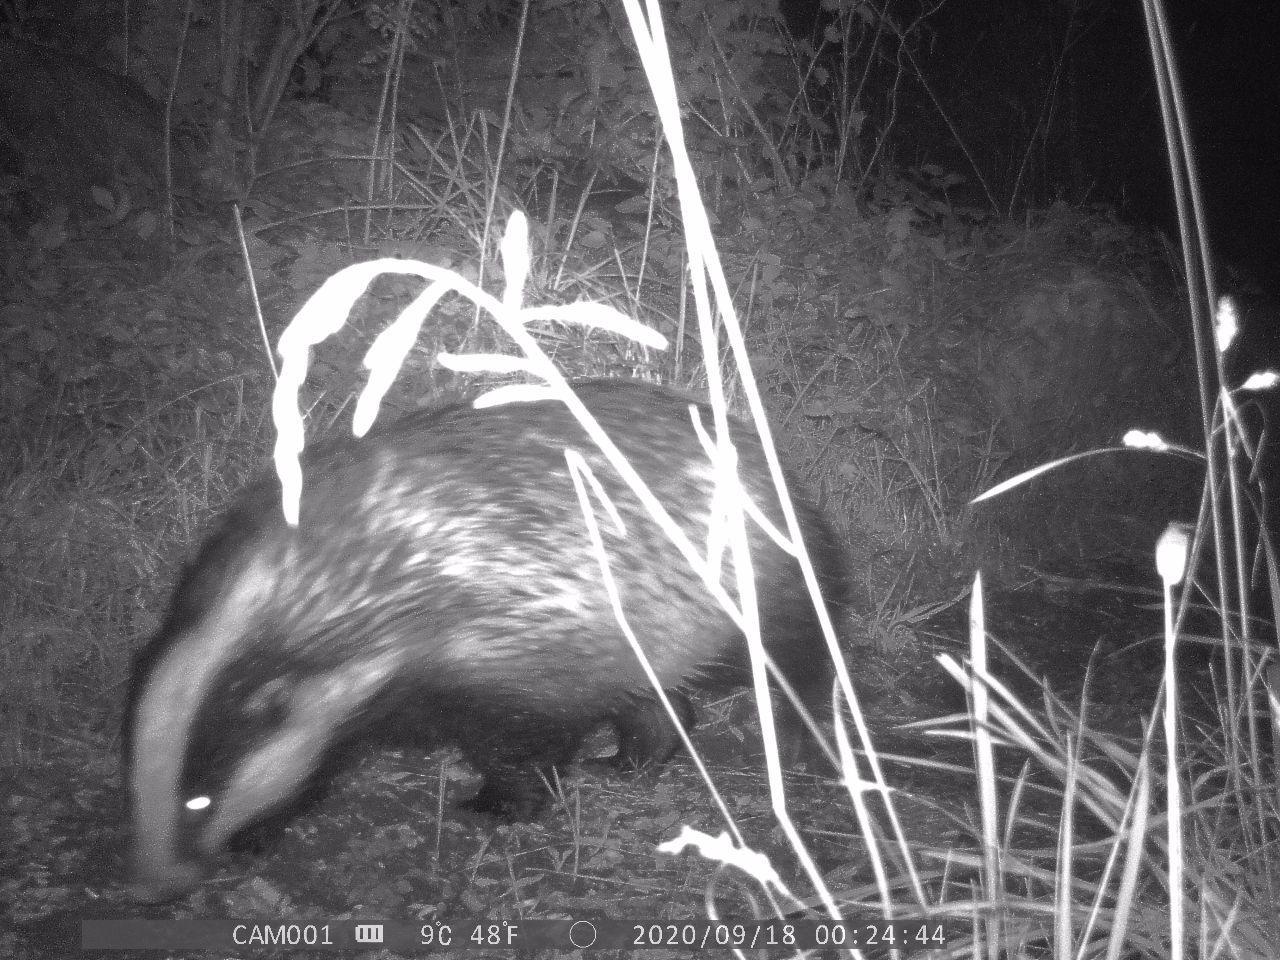 Badger walks through centre-frame nose sniffing along the ground